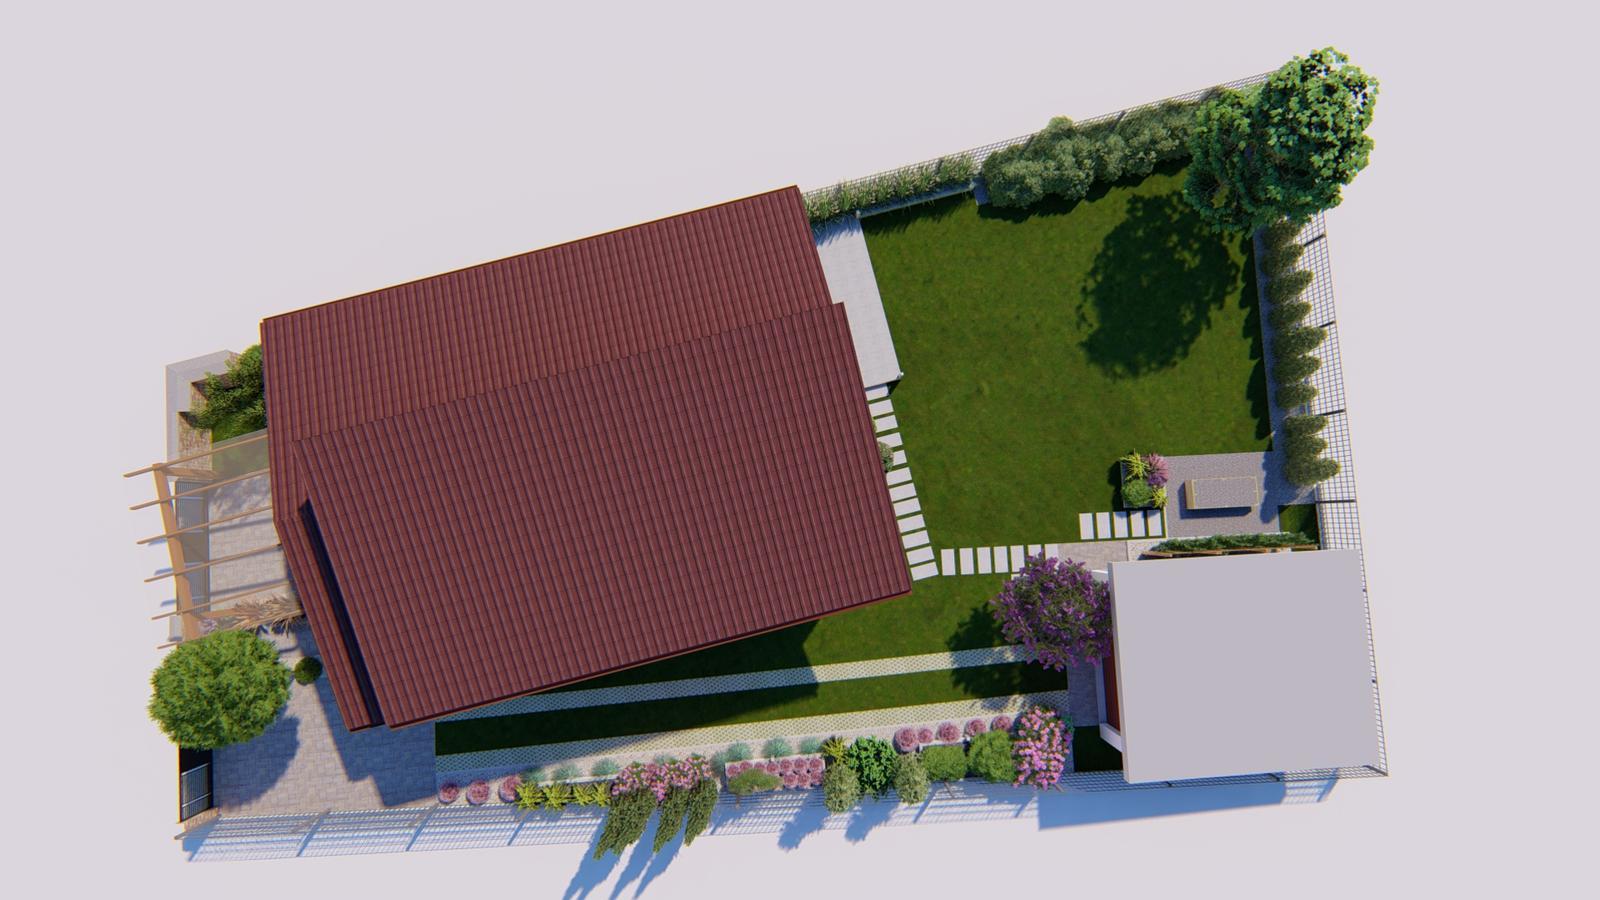 Návrh záhrady rodinného domu. - Obrázok č. 8